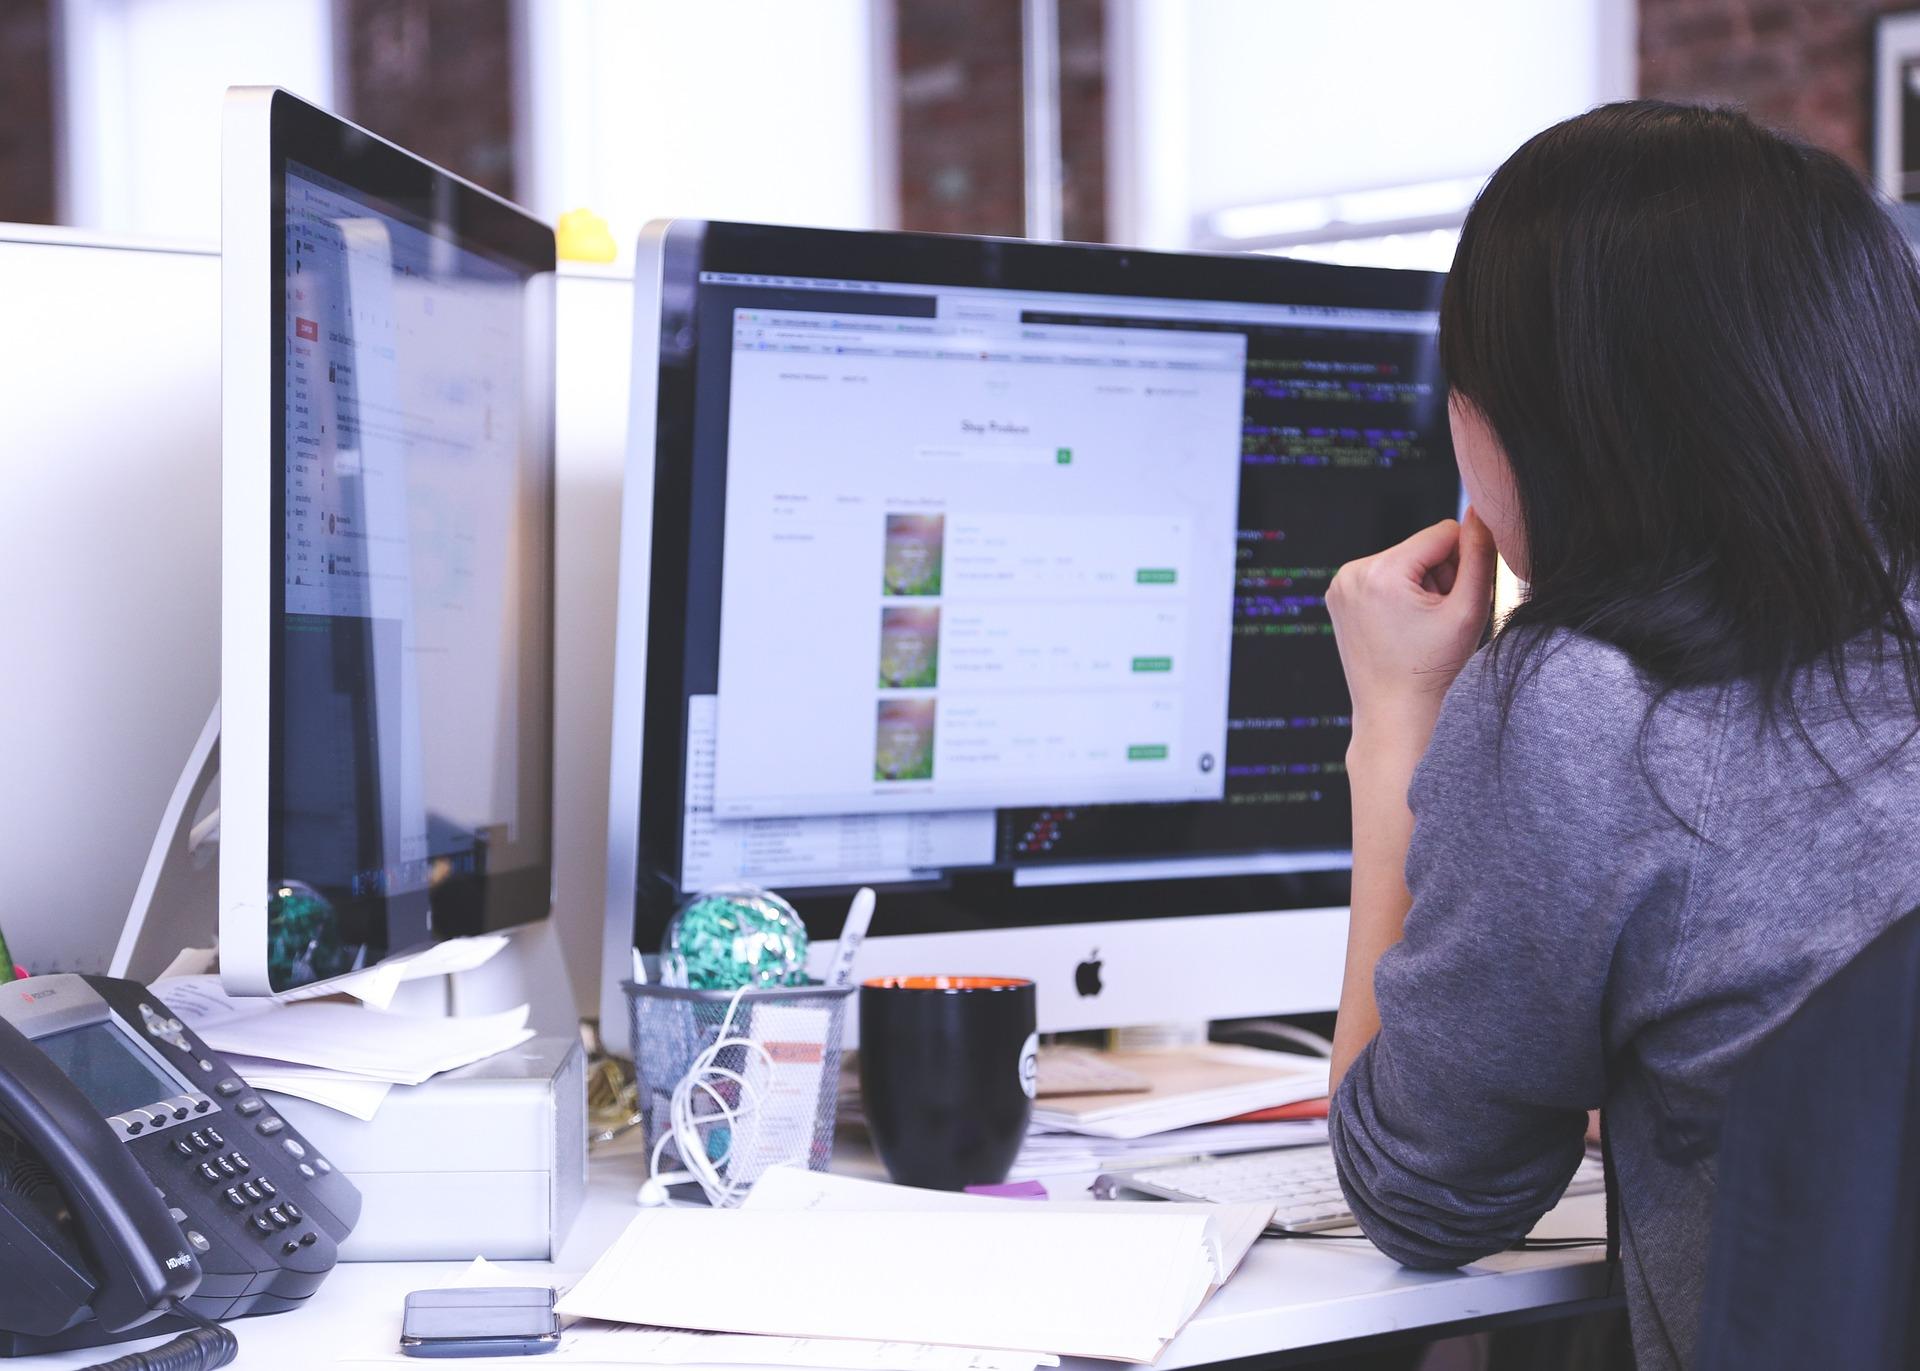 Personeelsplanning |Beheer van werknemers | Traxgo